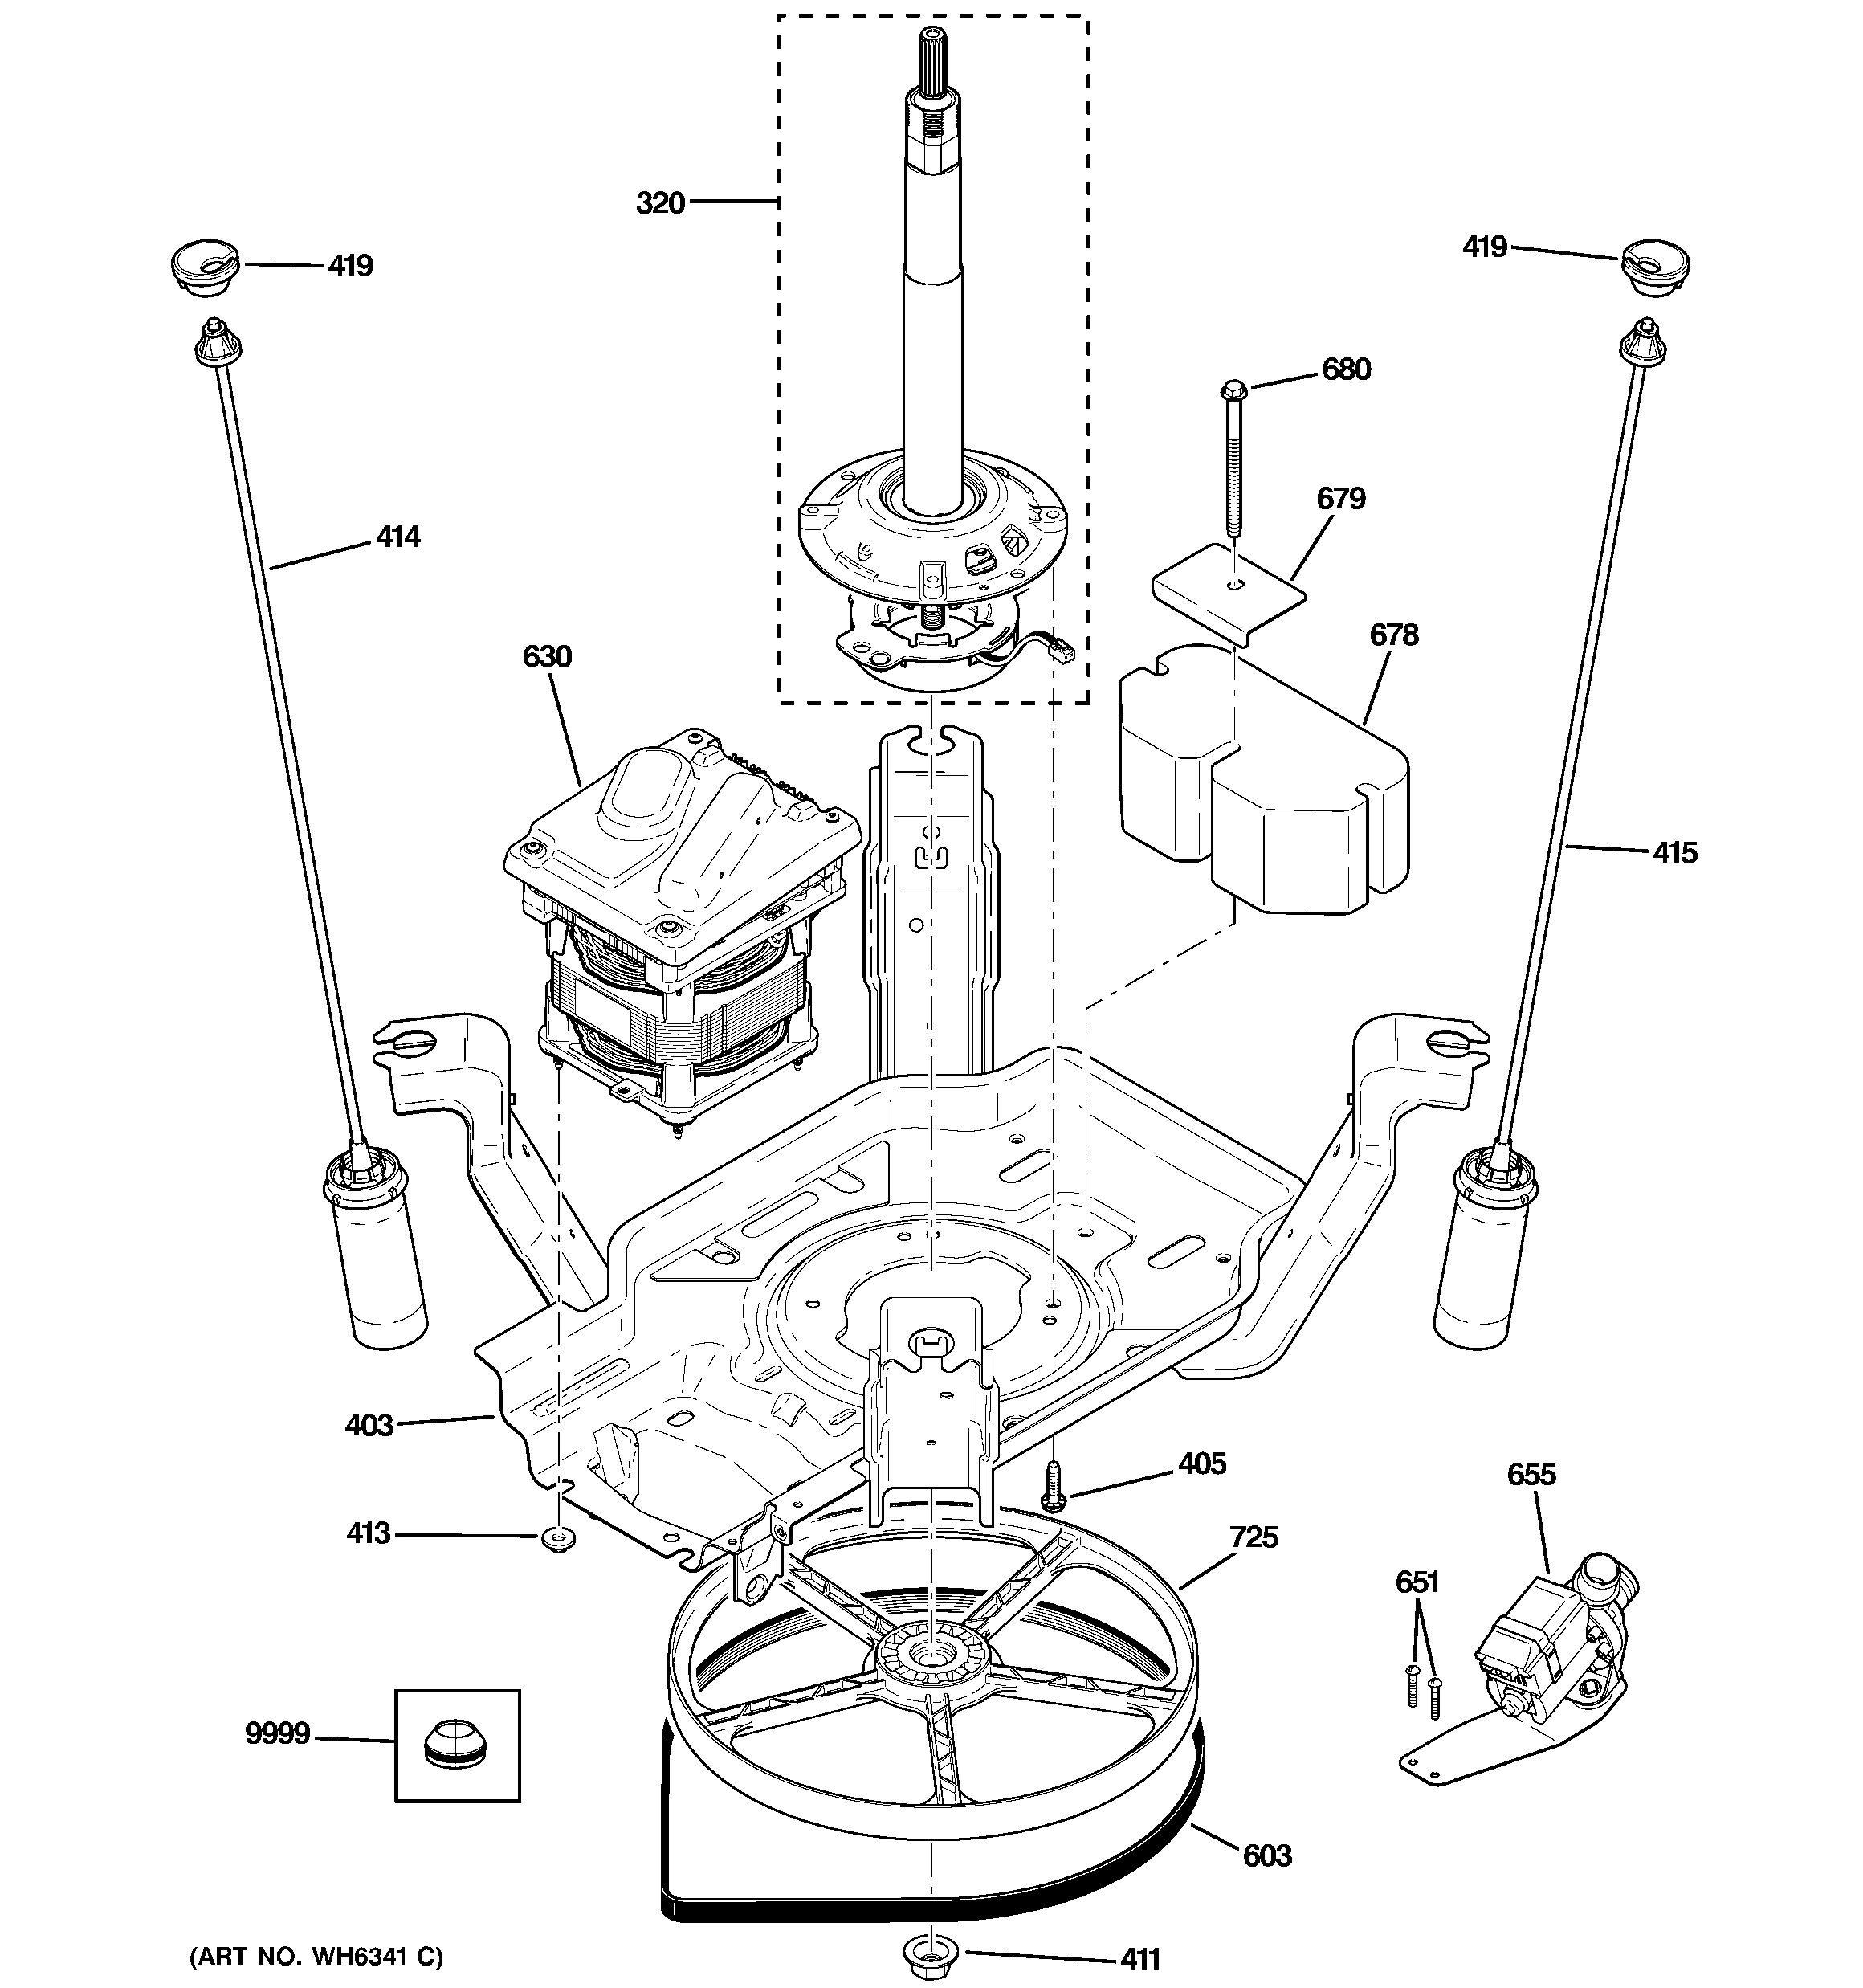 50 Hotpoint Dryer Parts Diagram Ta8s Di